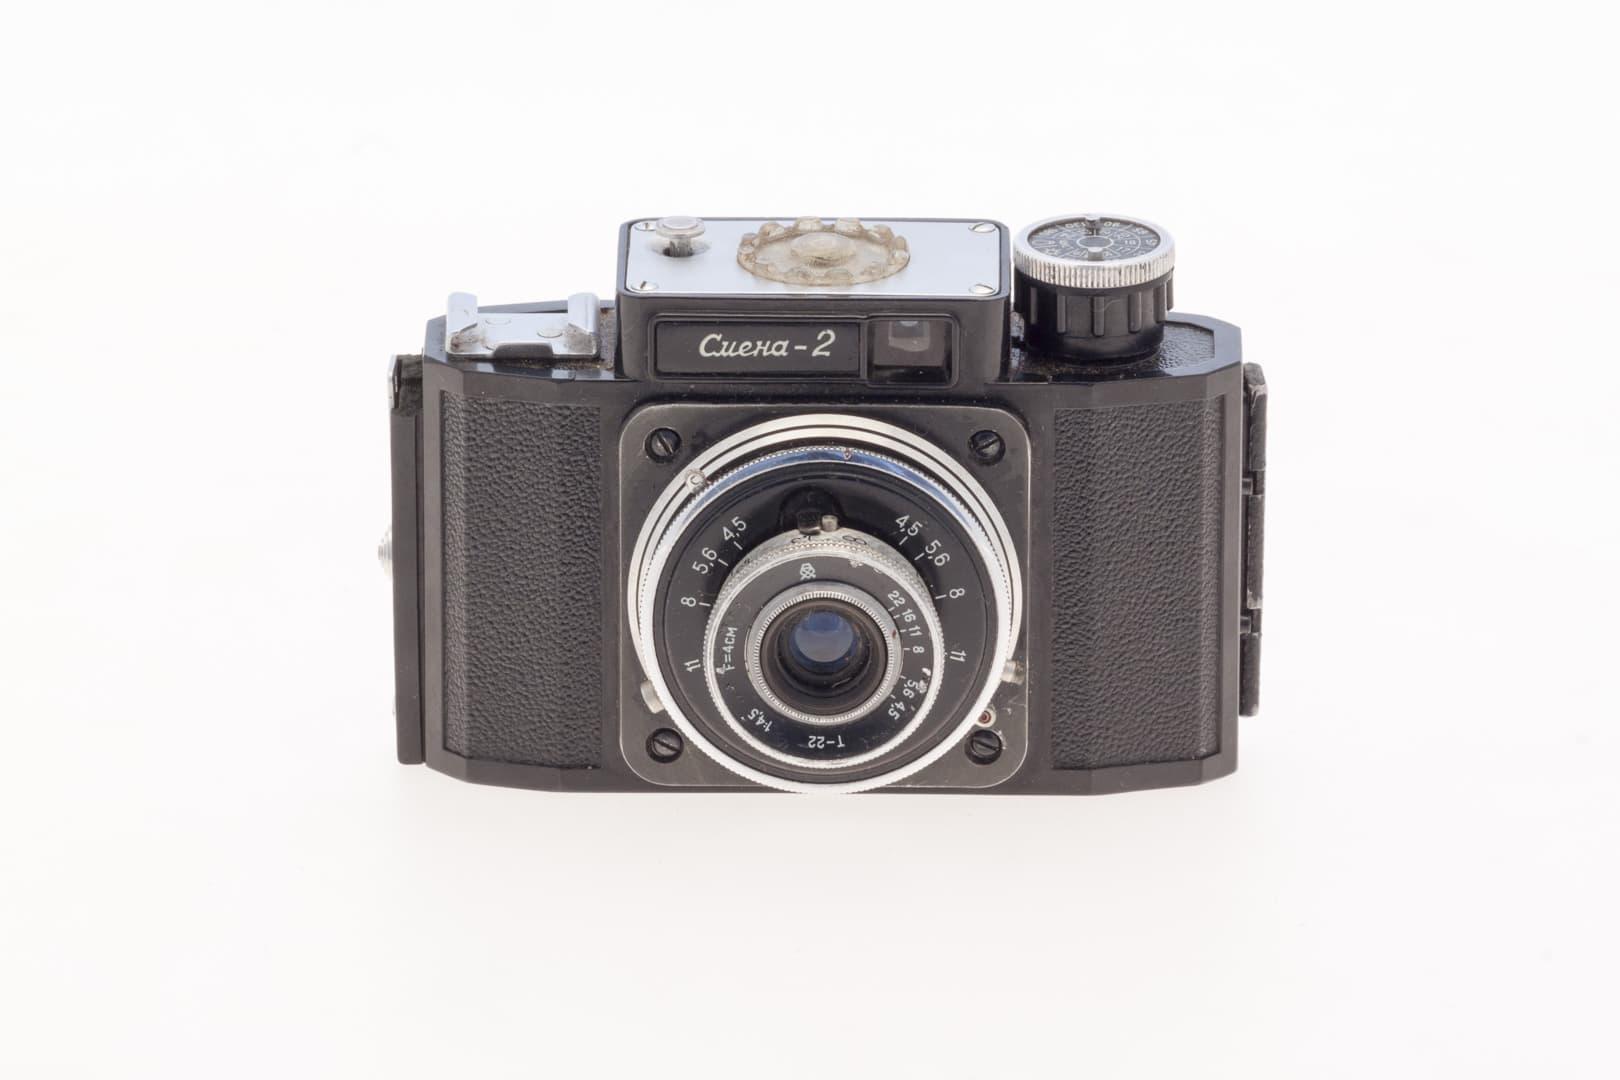 Smena 2 (Смена) – Soviet 35mm Compact Film Camera Front View